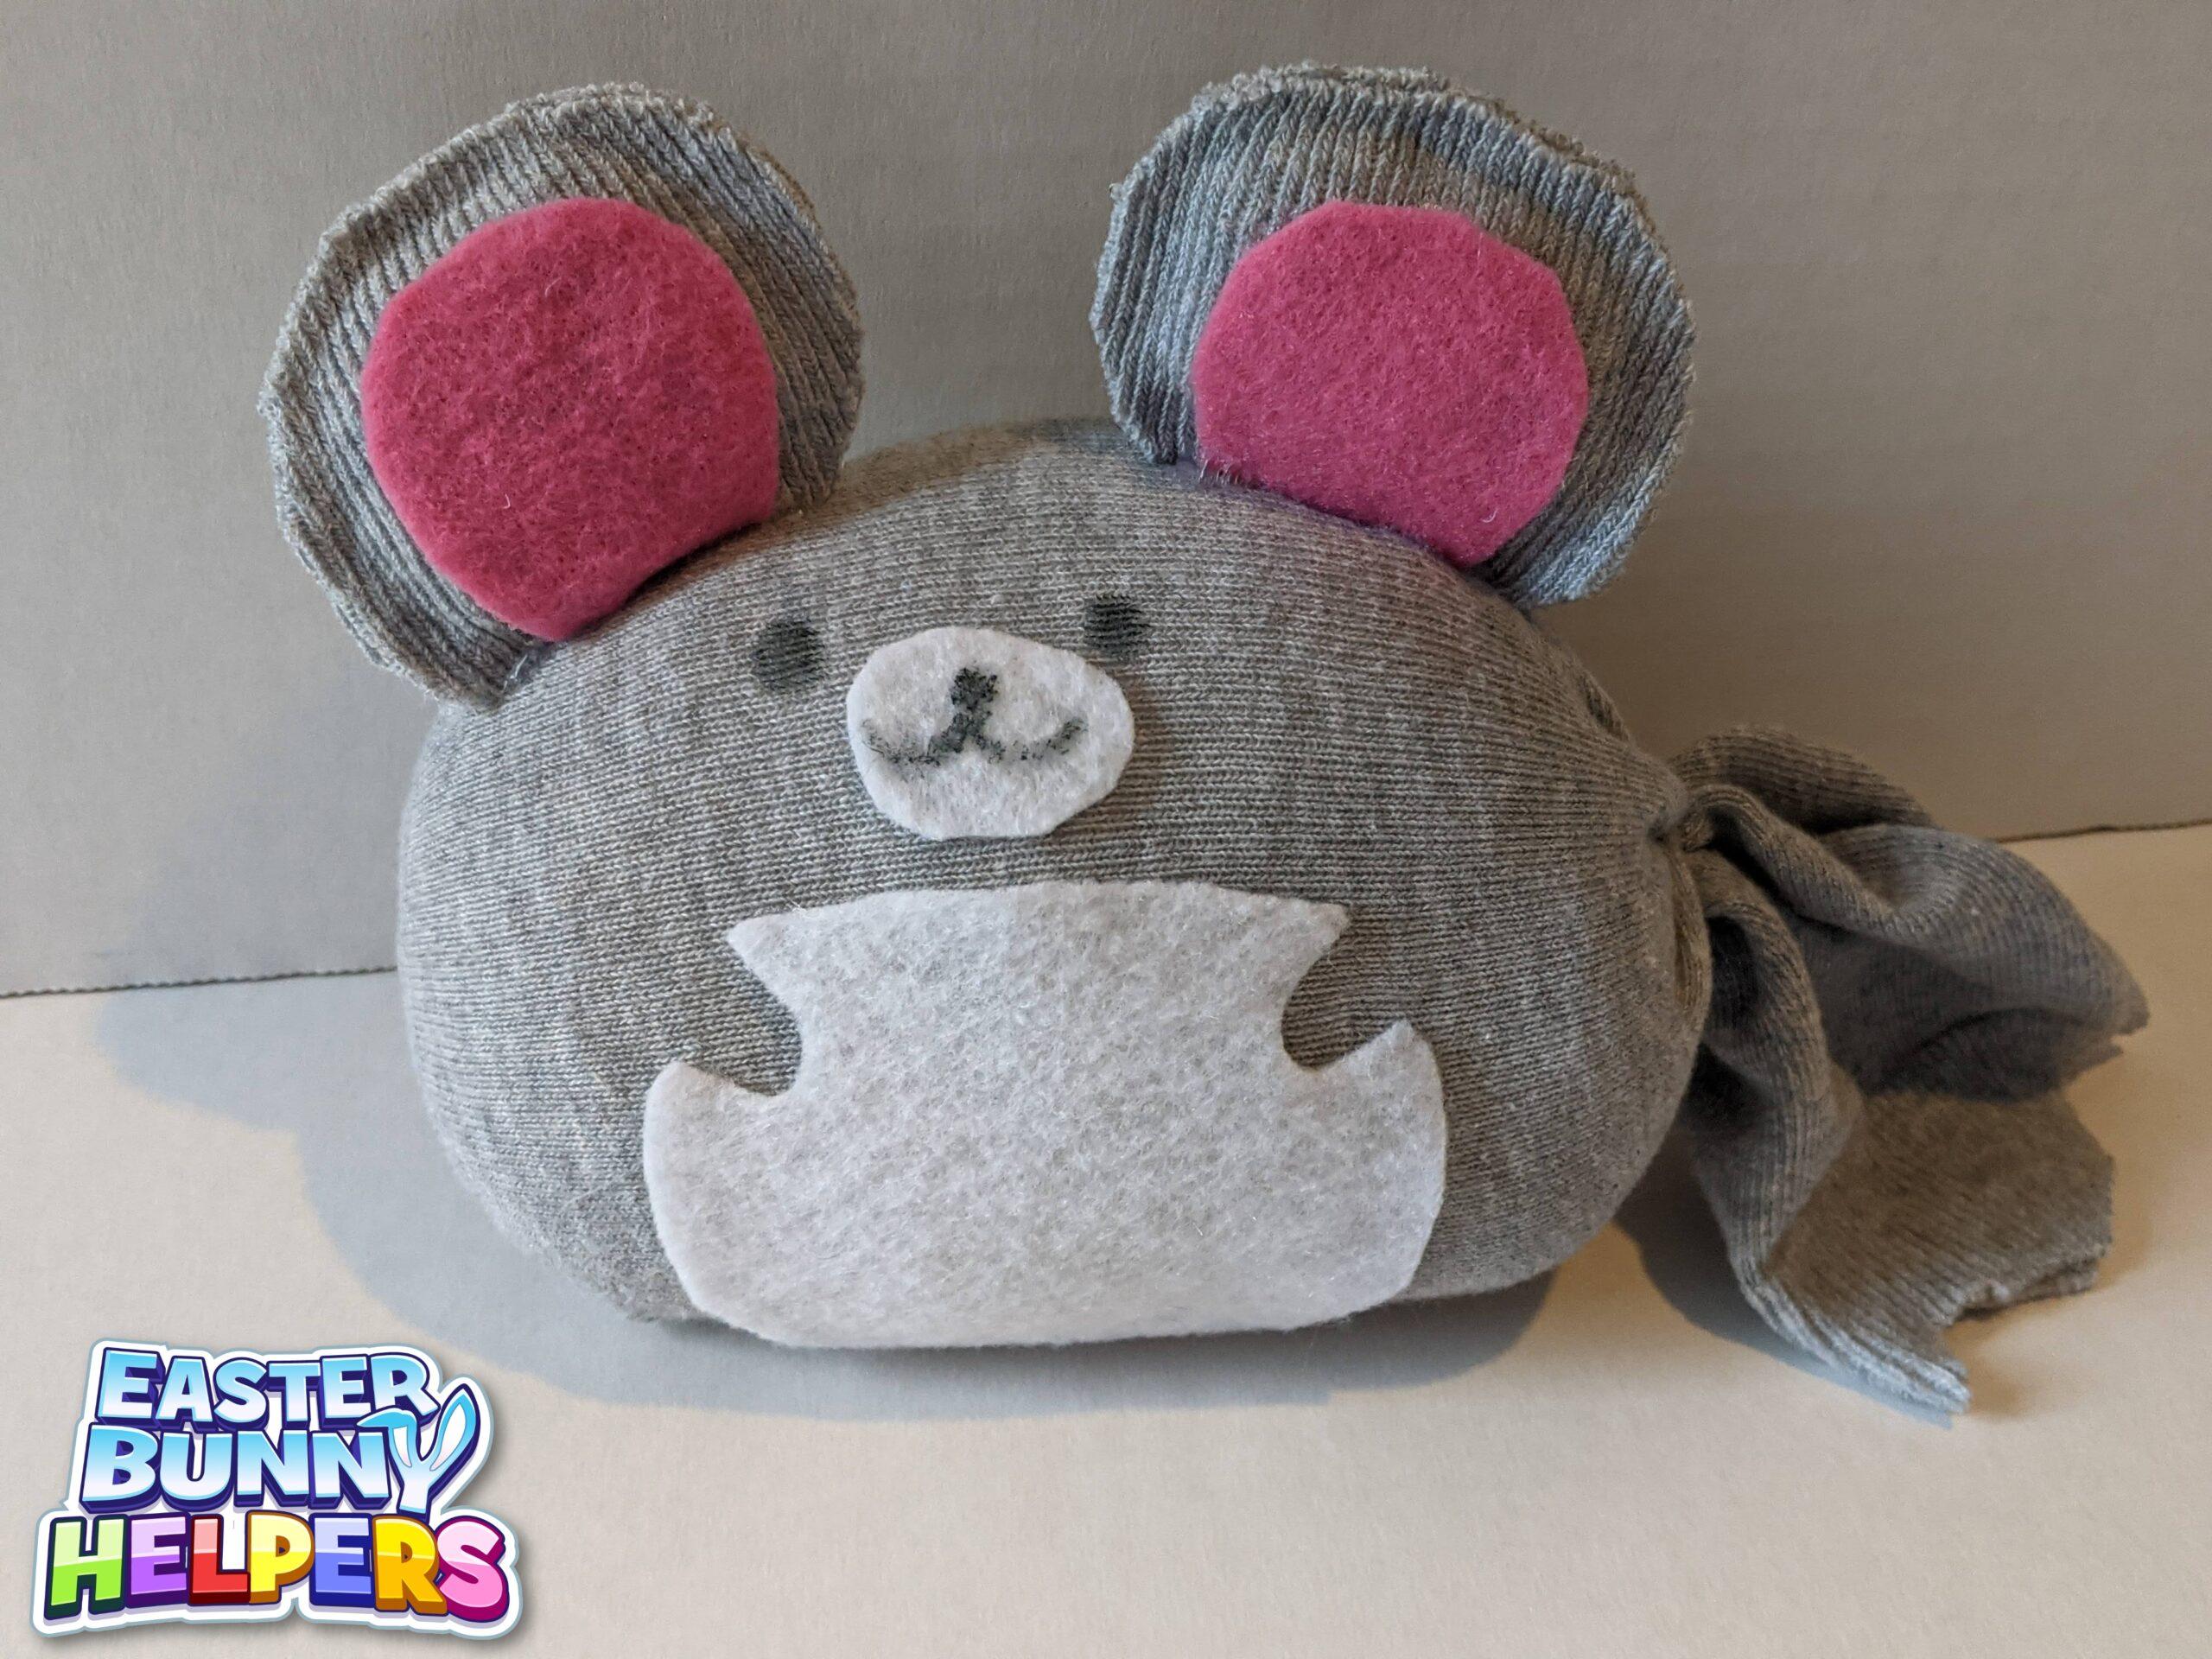 Chinchilla Easter Bunny Helper Craft